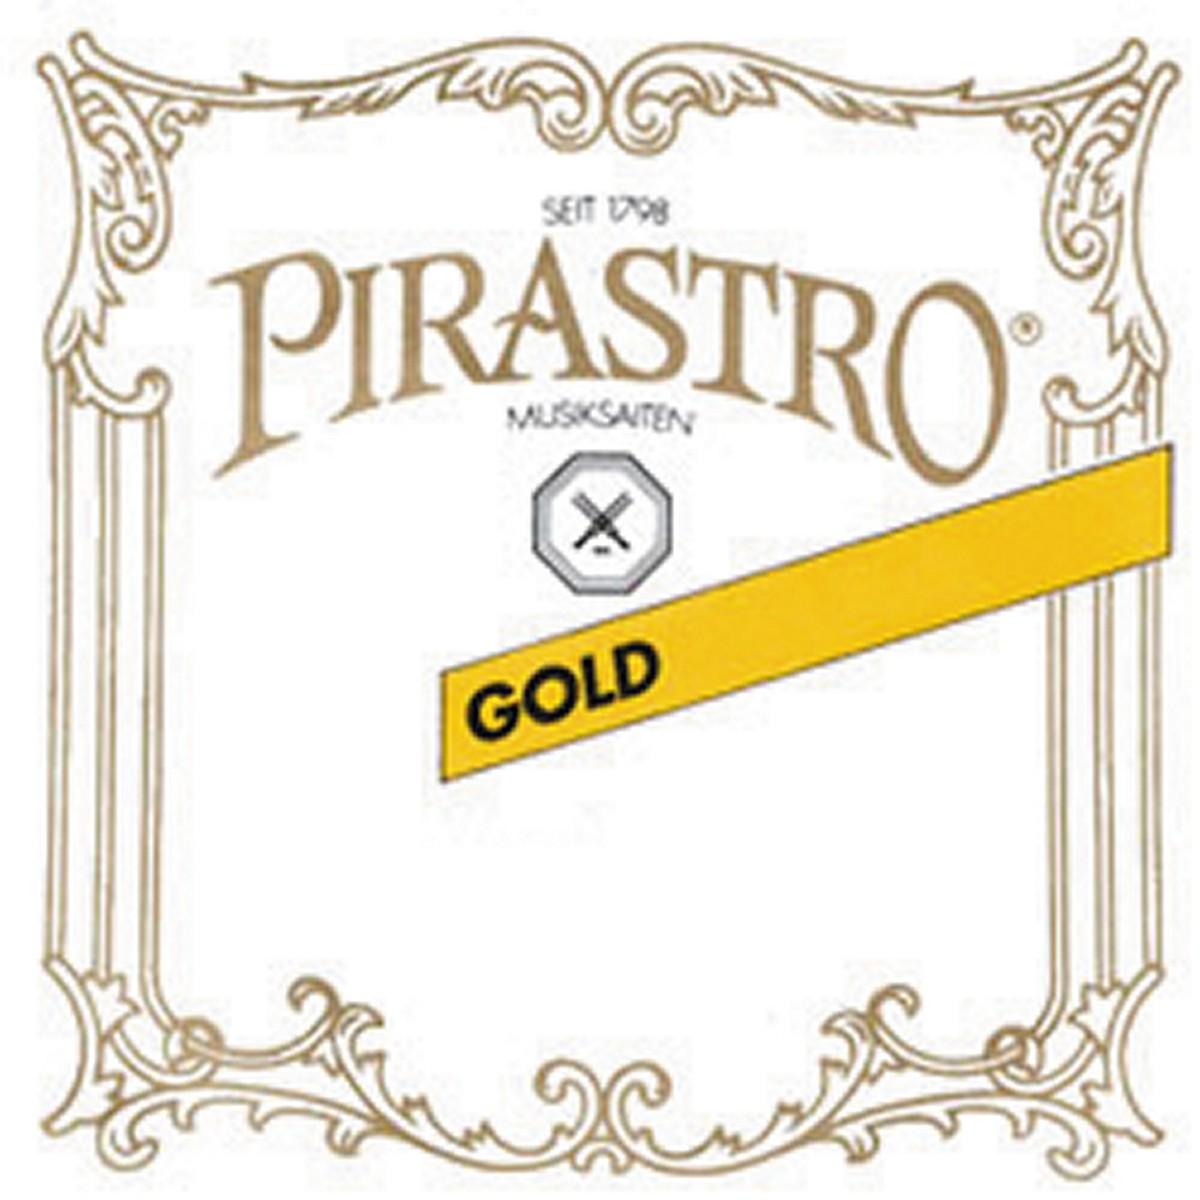 Pirastro Wondertone Gold Label Series Cello String Set